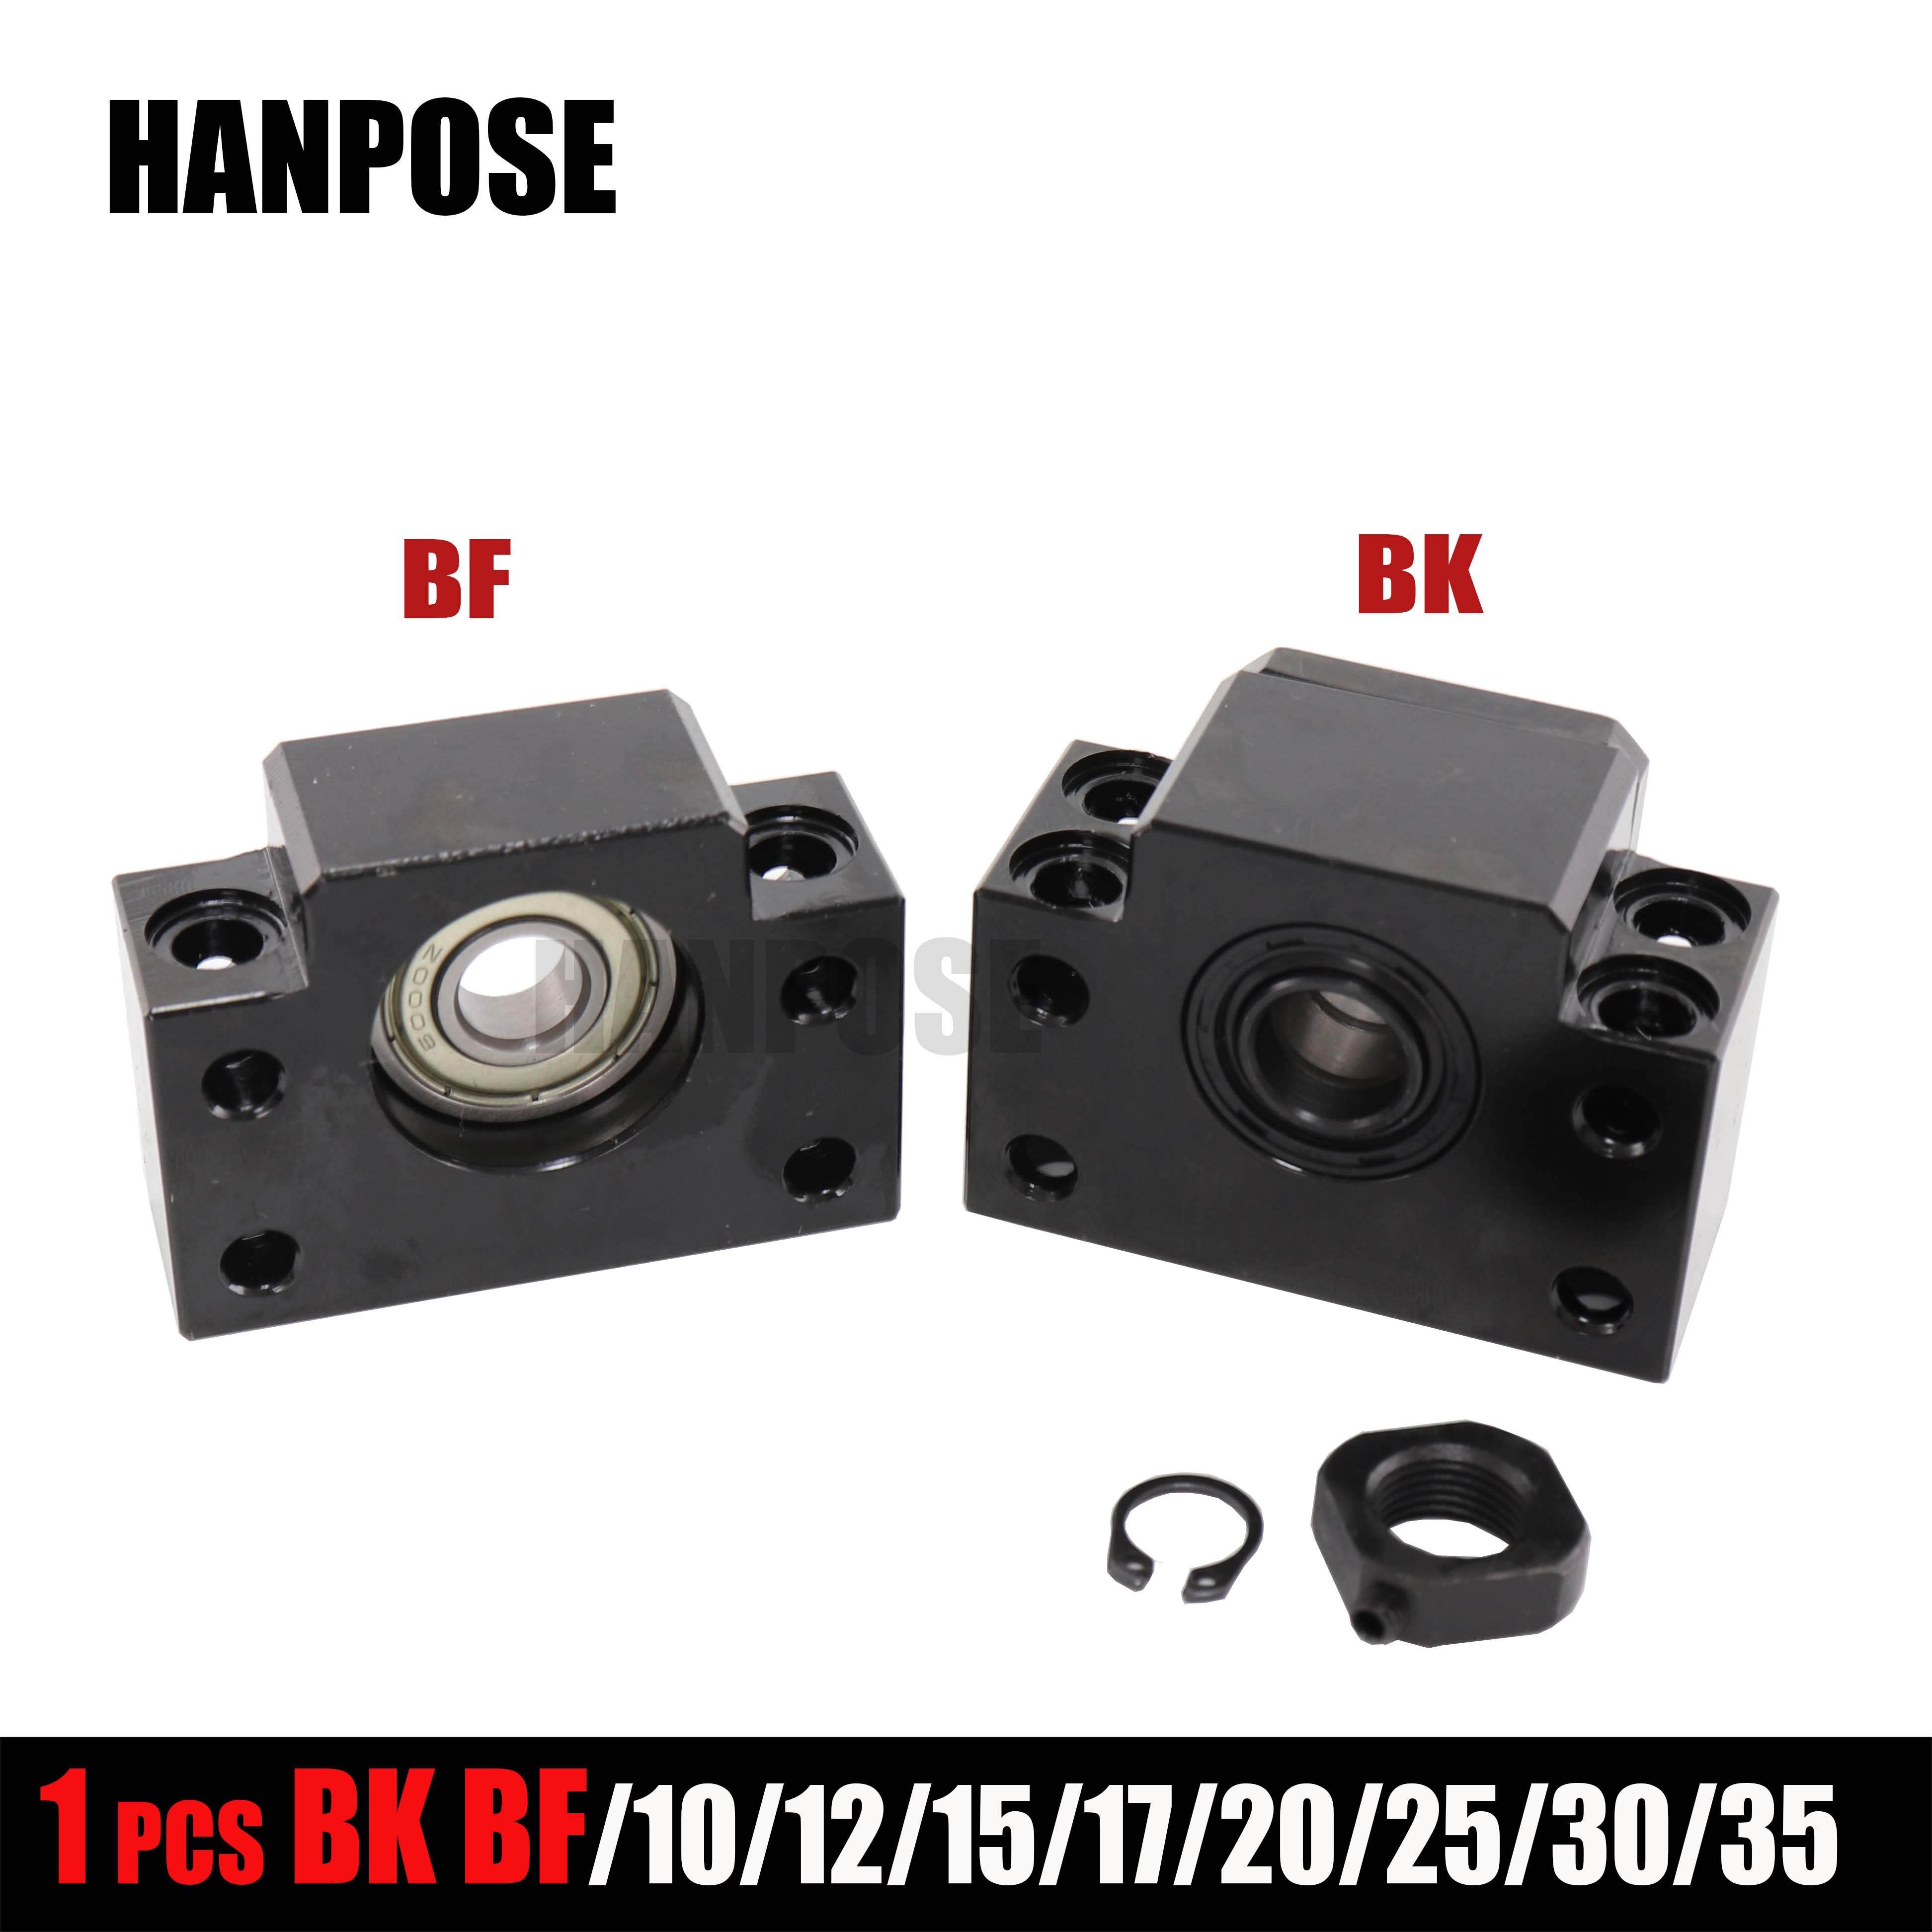 Unidade de apoio BK10 1PCS SFU1204 BF10 BK12 BF12 BK17 BF17 BK20 BF20 para ballscrew